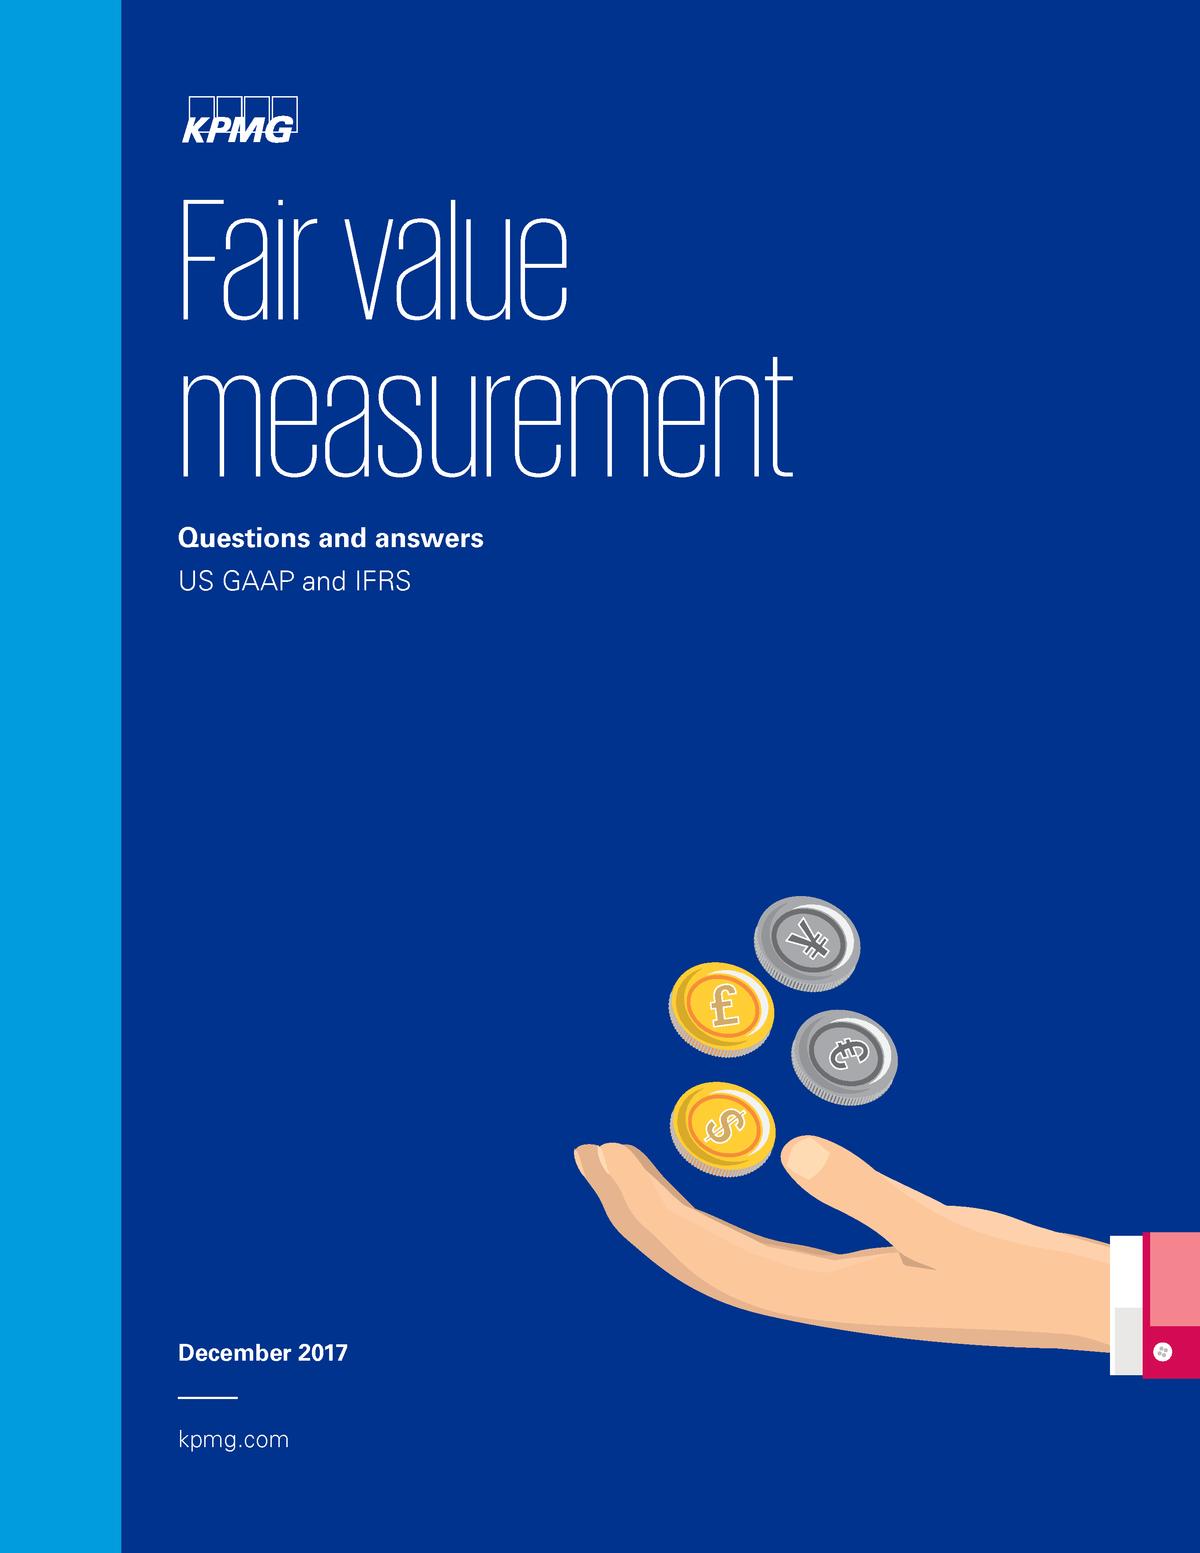 How to determine fair value - KET201 : Accounting - StuDocu